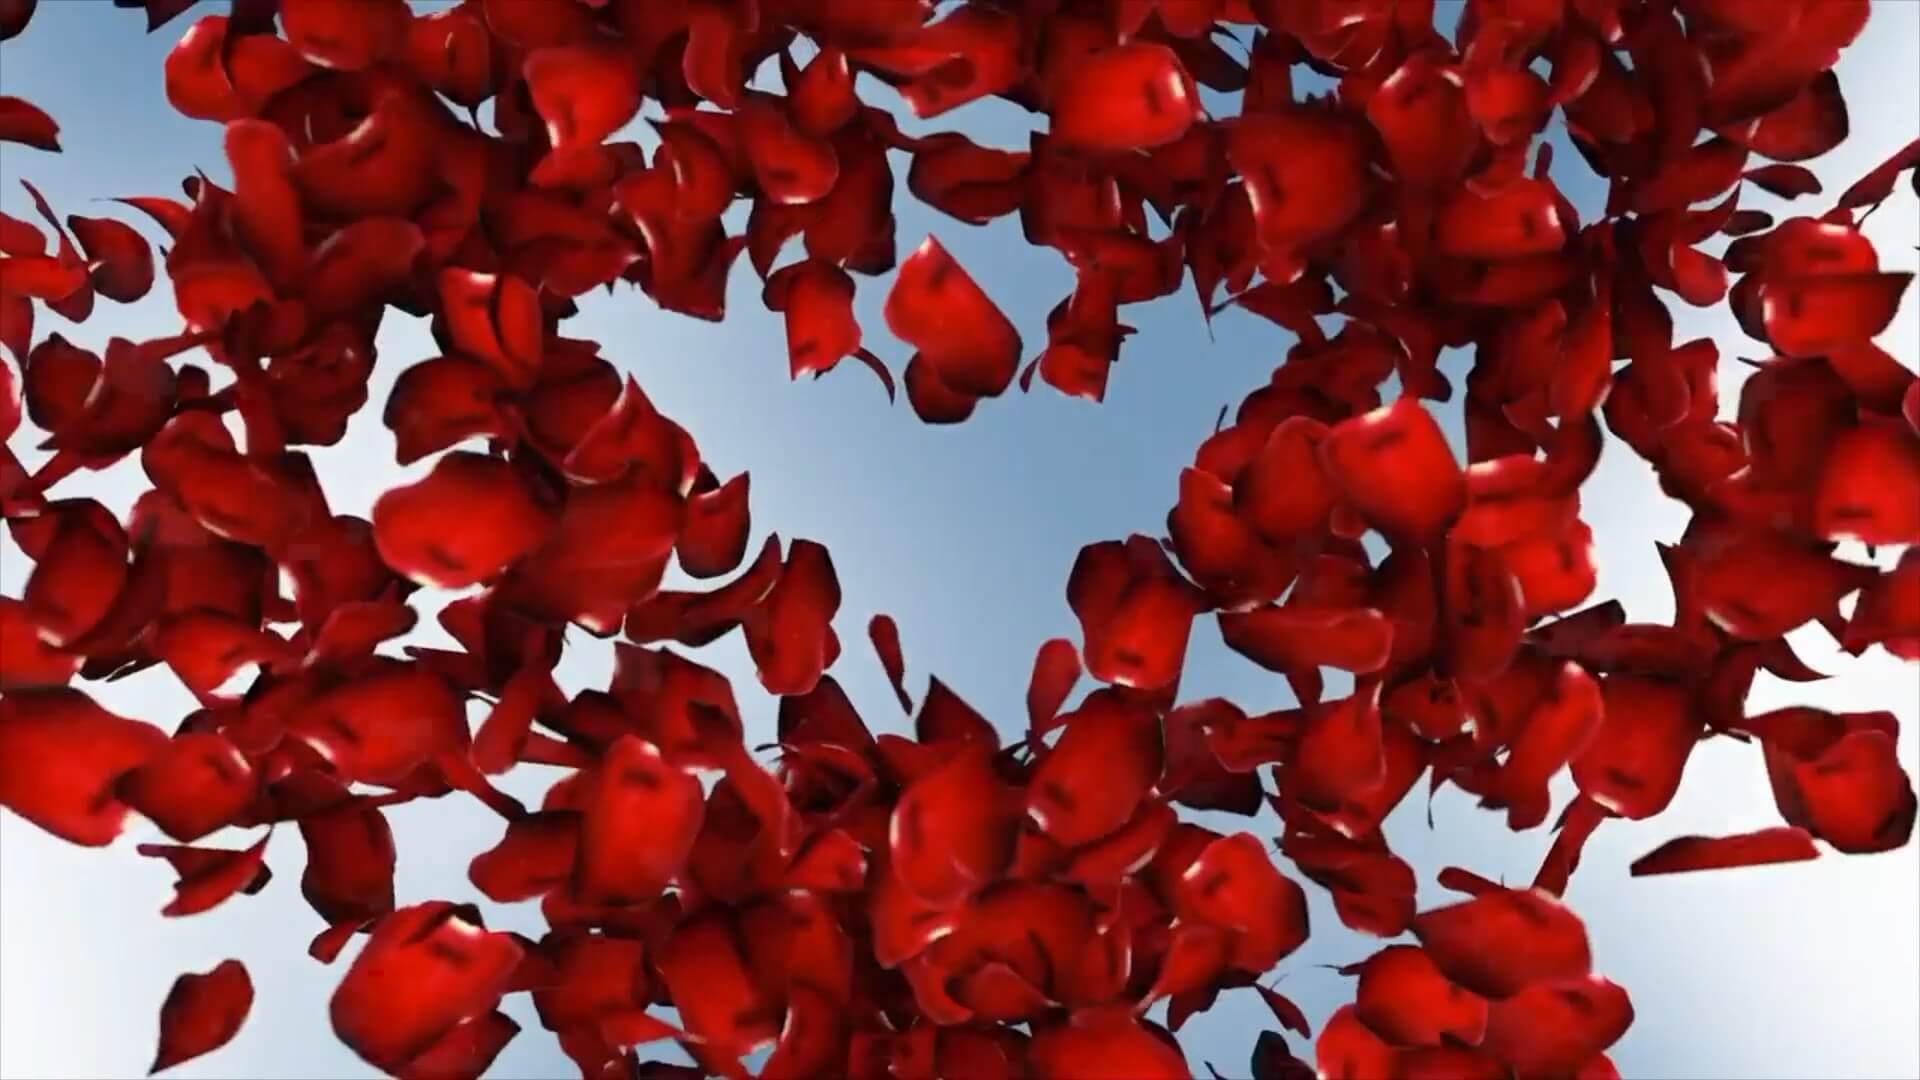 fcpx插件 玫瑰花瓣散落动画徽标LOGO展示片头模板 LOVE LOGO